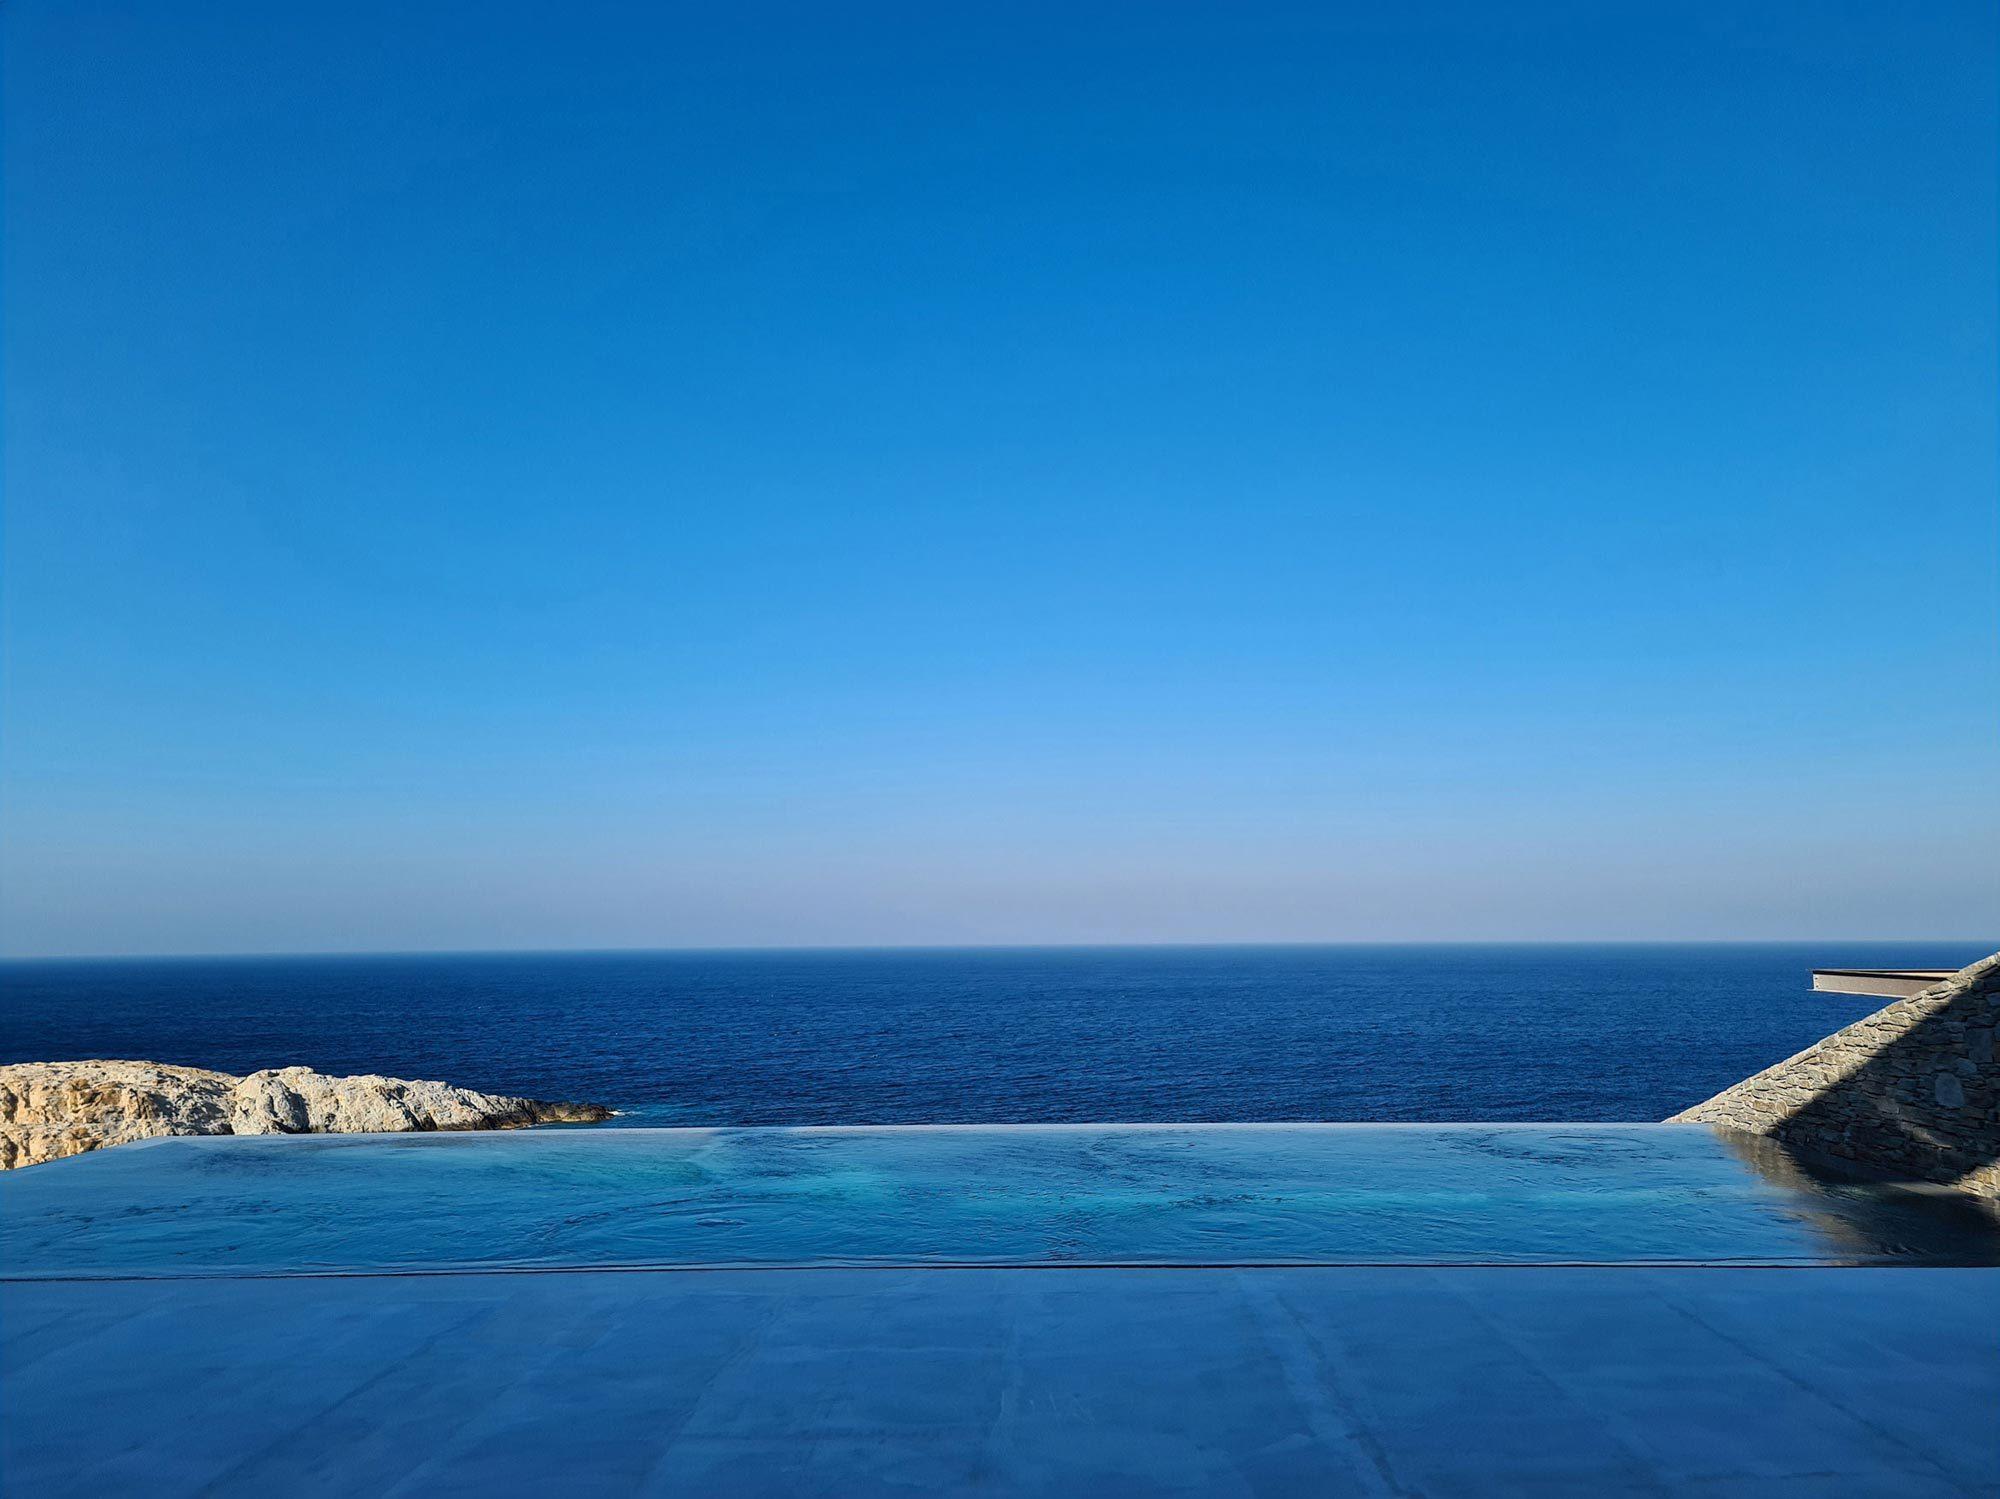 Infinity-Pool mit Blick auf die Ägäis. Foto:Panagiotis Voumbakis